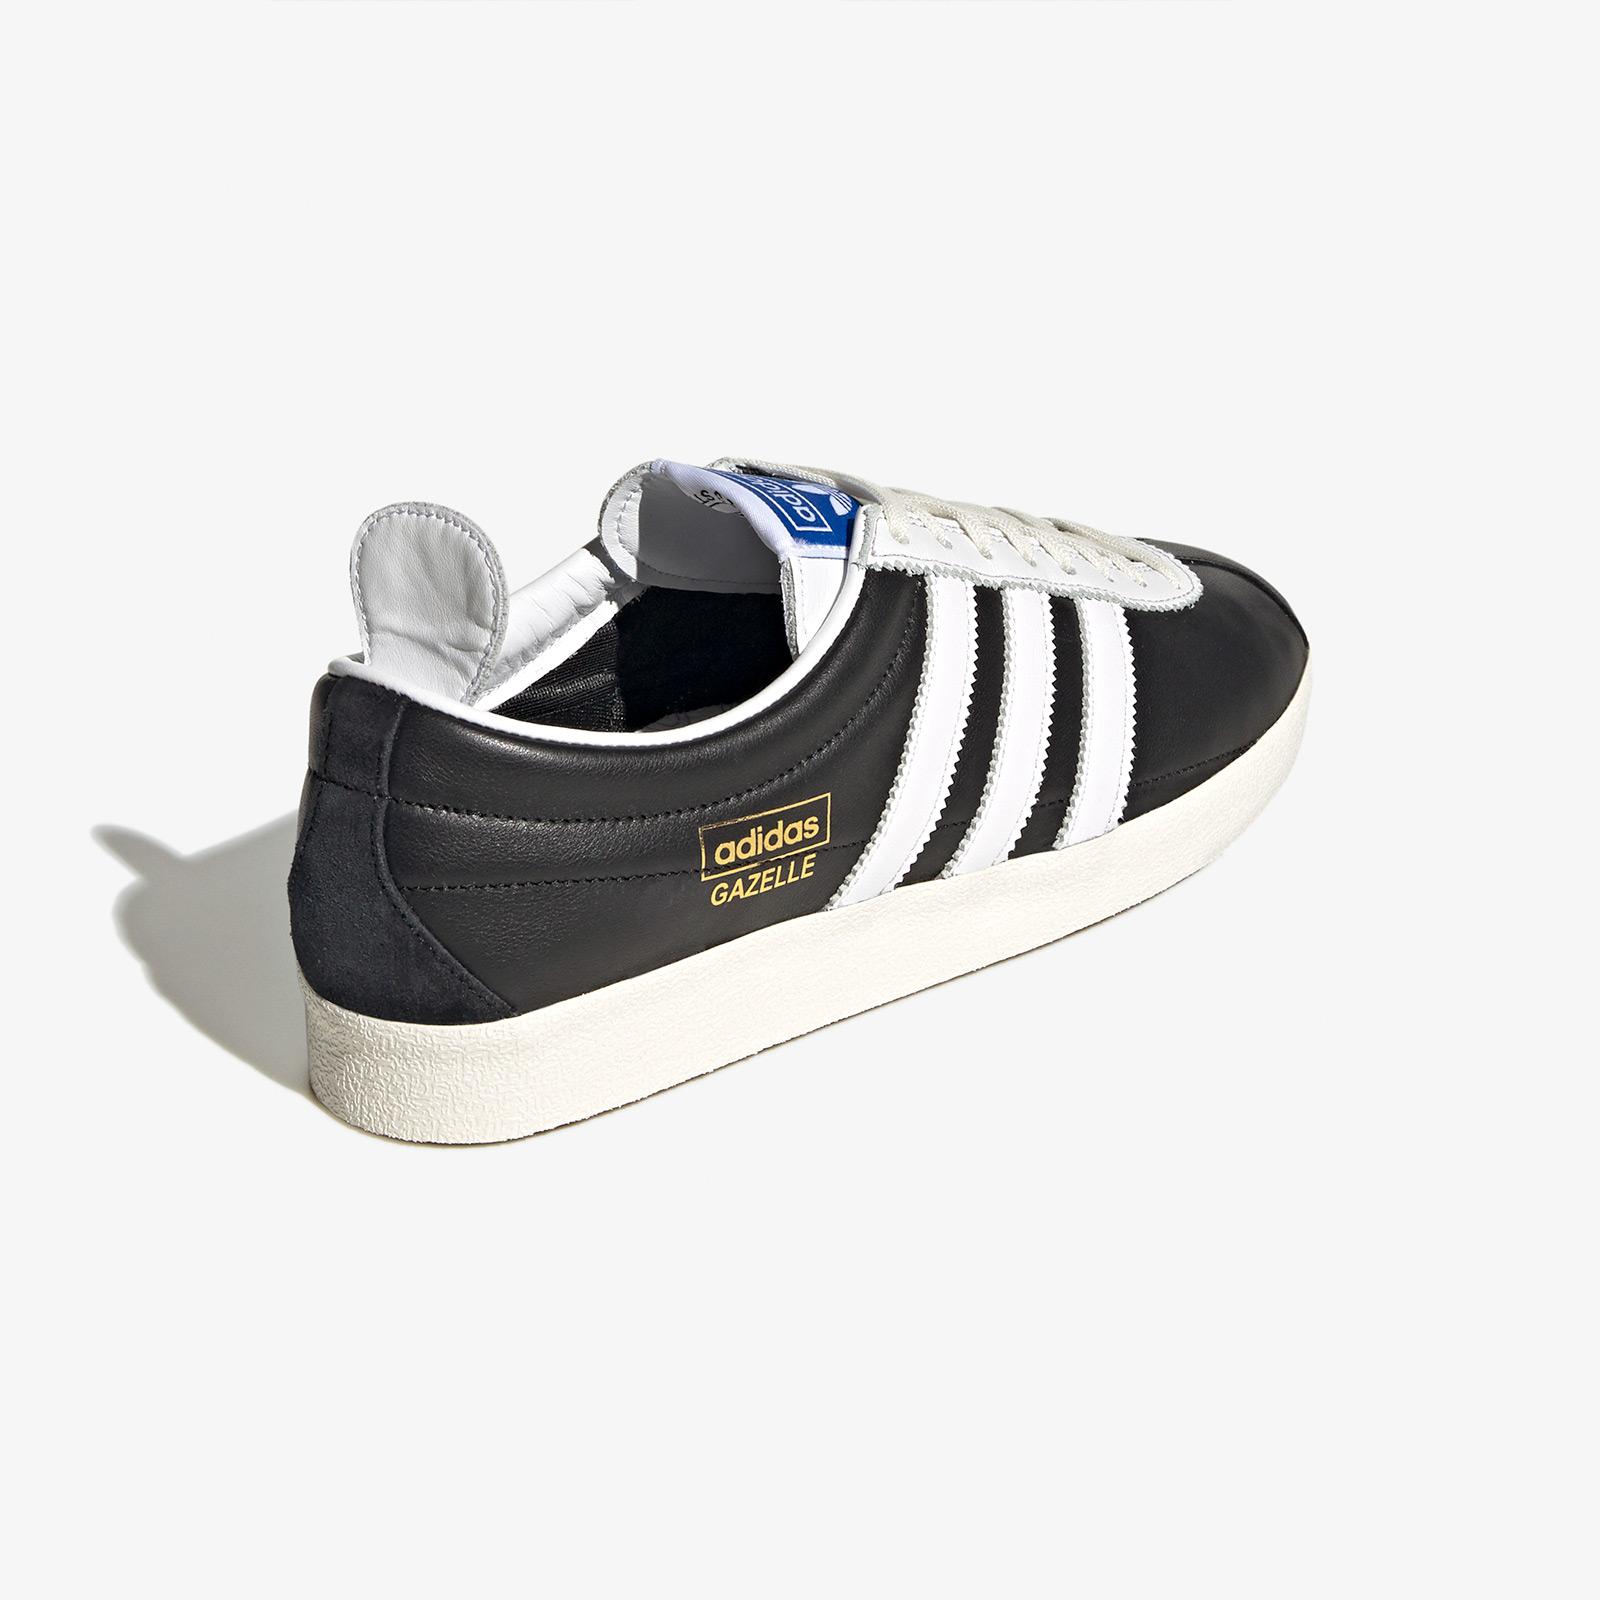 adidas Gazelle Vintage - Fu9658 - SNS   sneakers & streetwear en ...